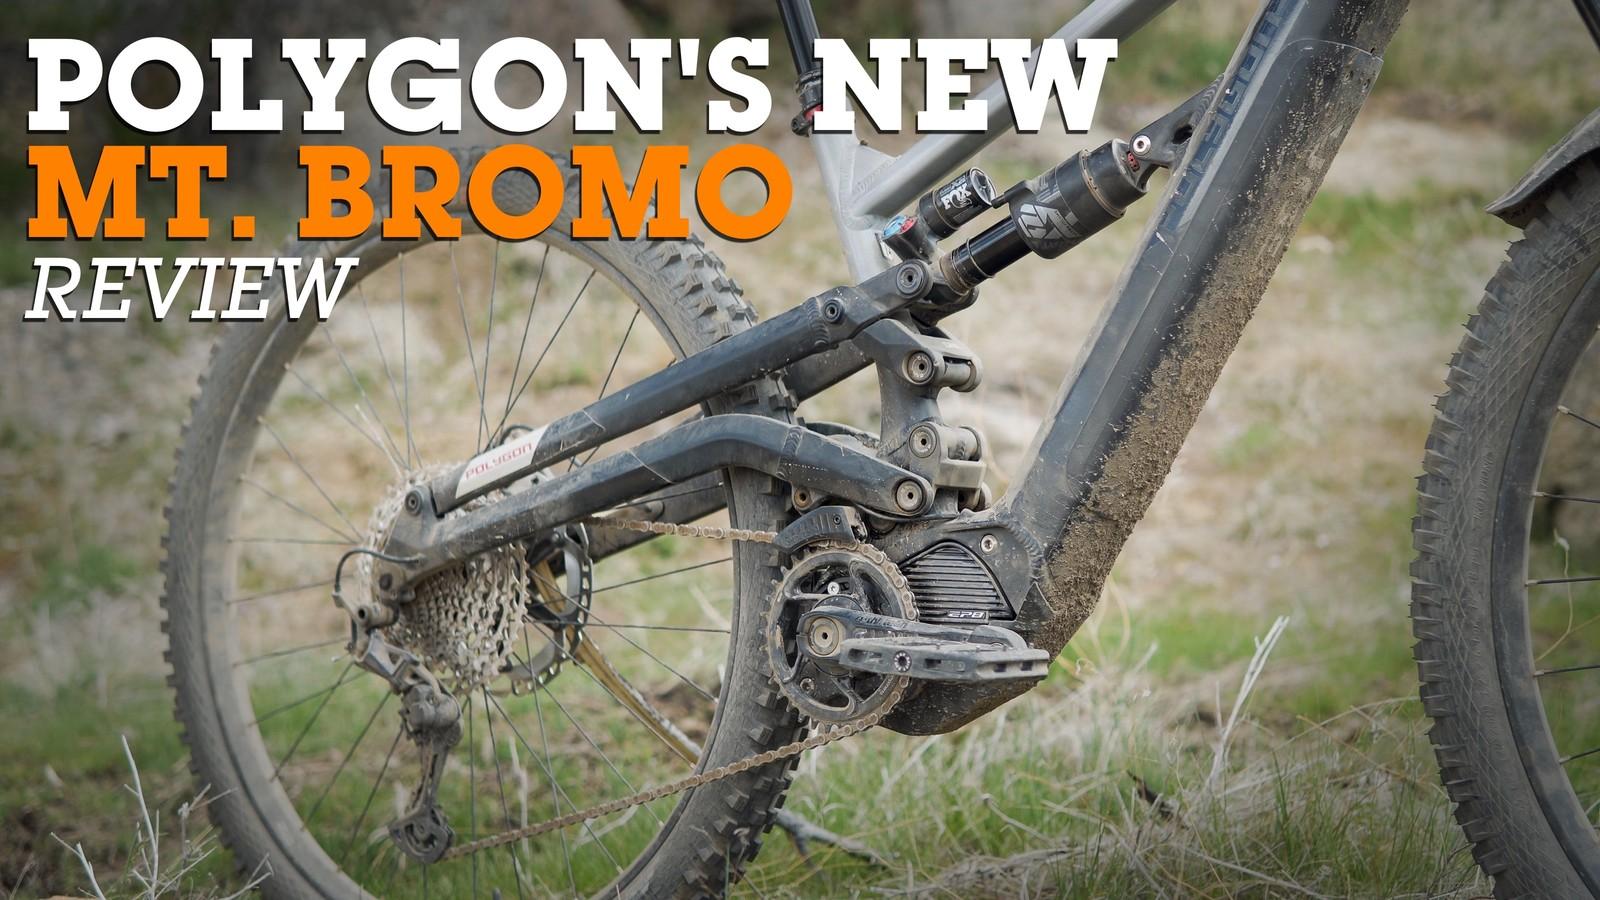 Enter the Plow King - Polygon's Crazy Six-Bar Mt Bromo eMTB Review